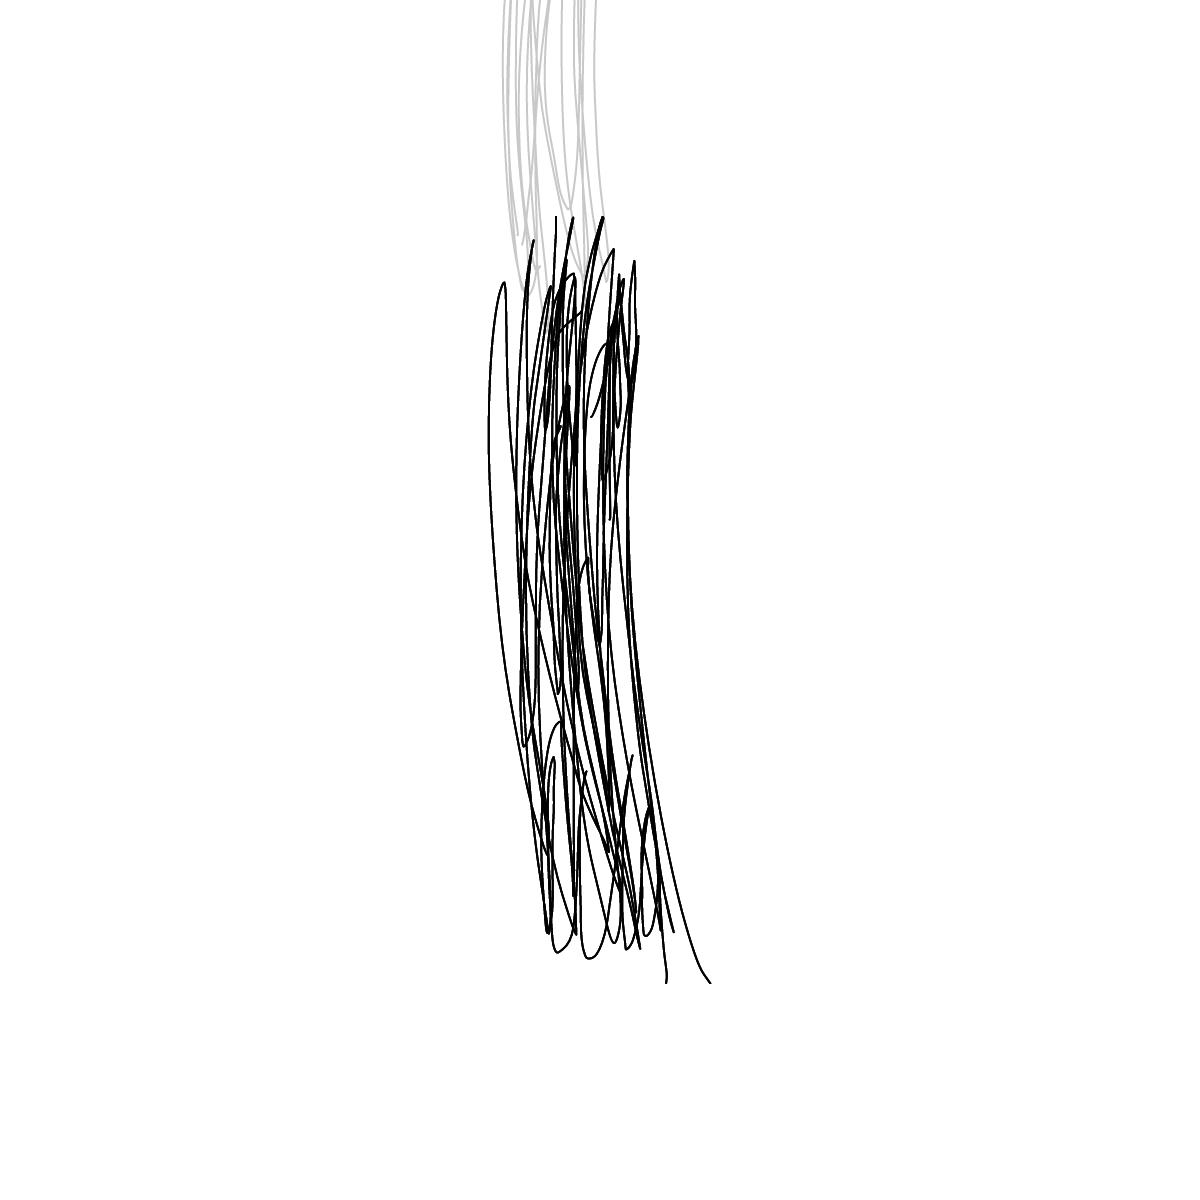 BAAAM drawing#23542 lat:65.0165100097656200lng: -158.3015289306640600